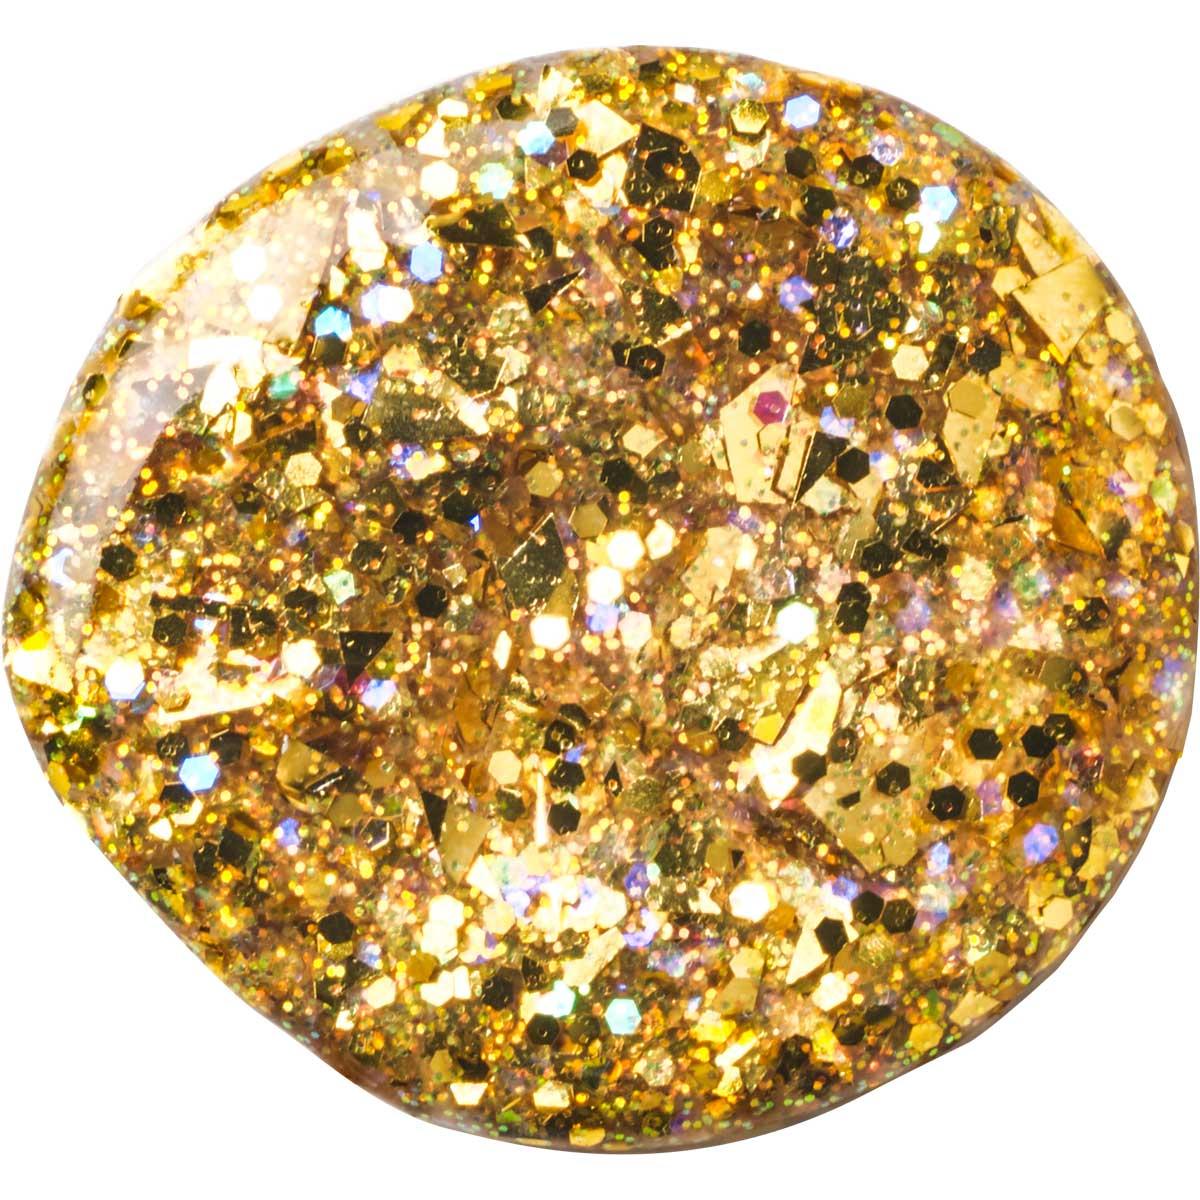 FolkArt ® Glitterific™ Acrylic Paint - Gold, 2 oz. - 5875